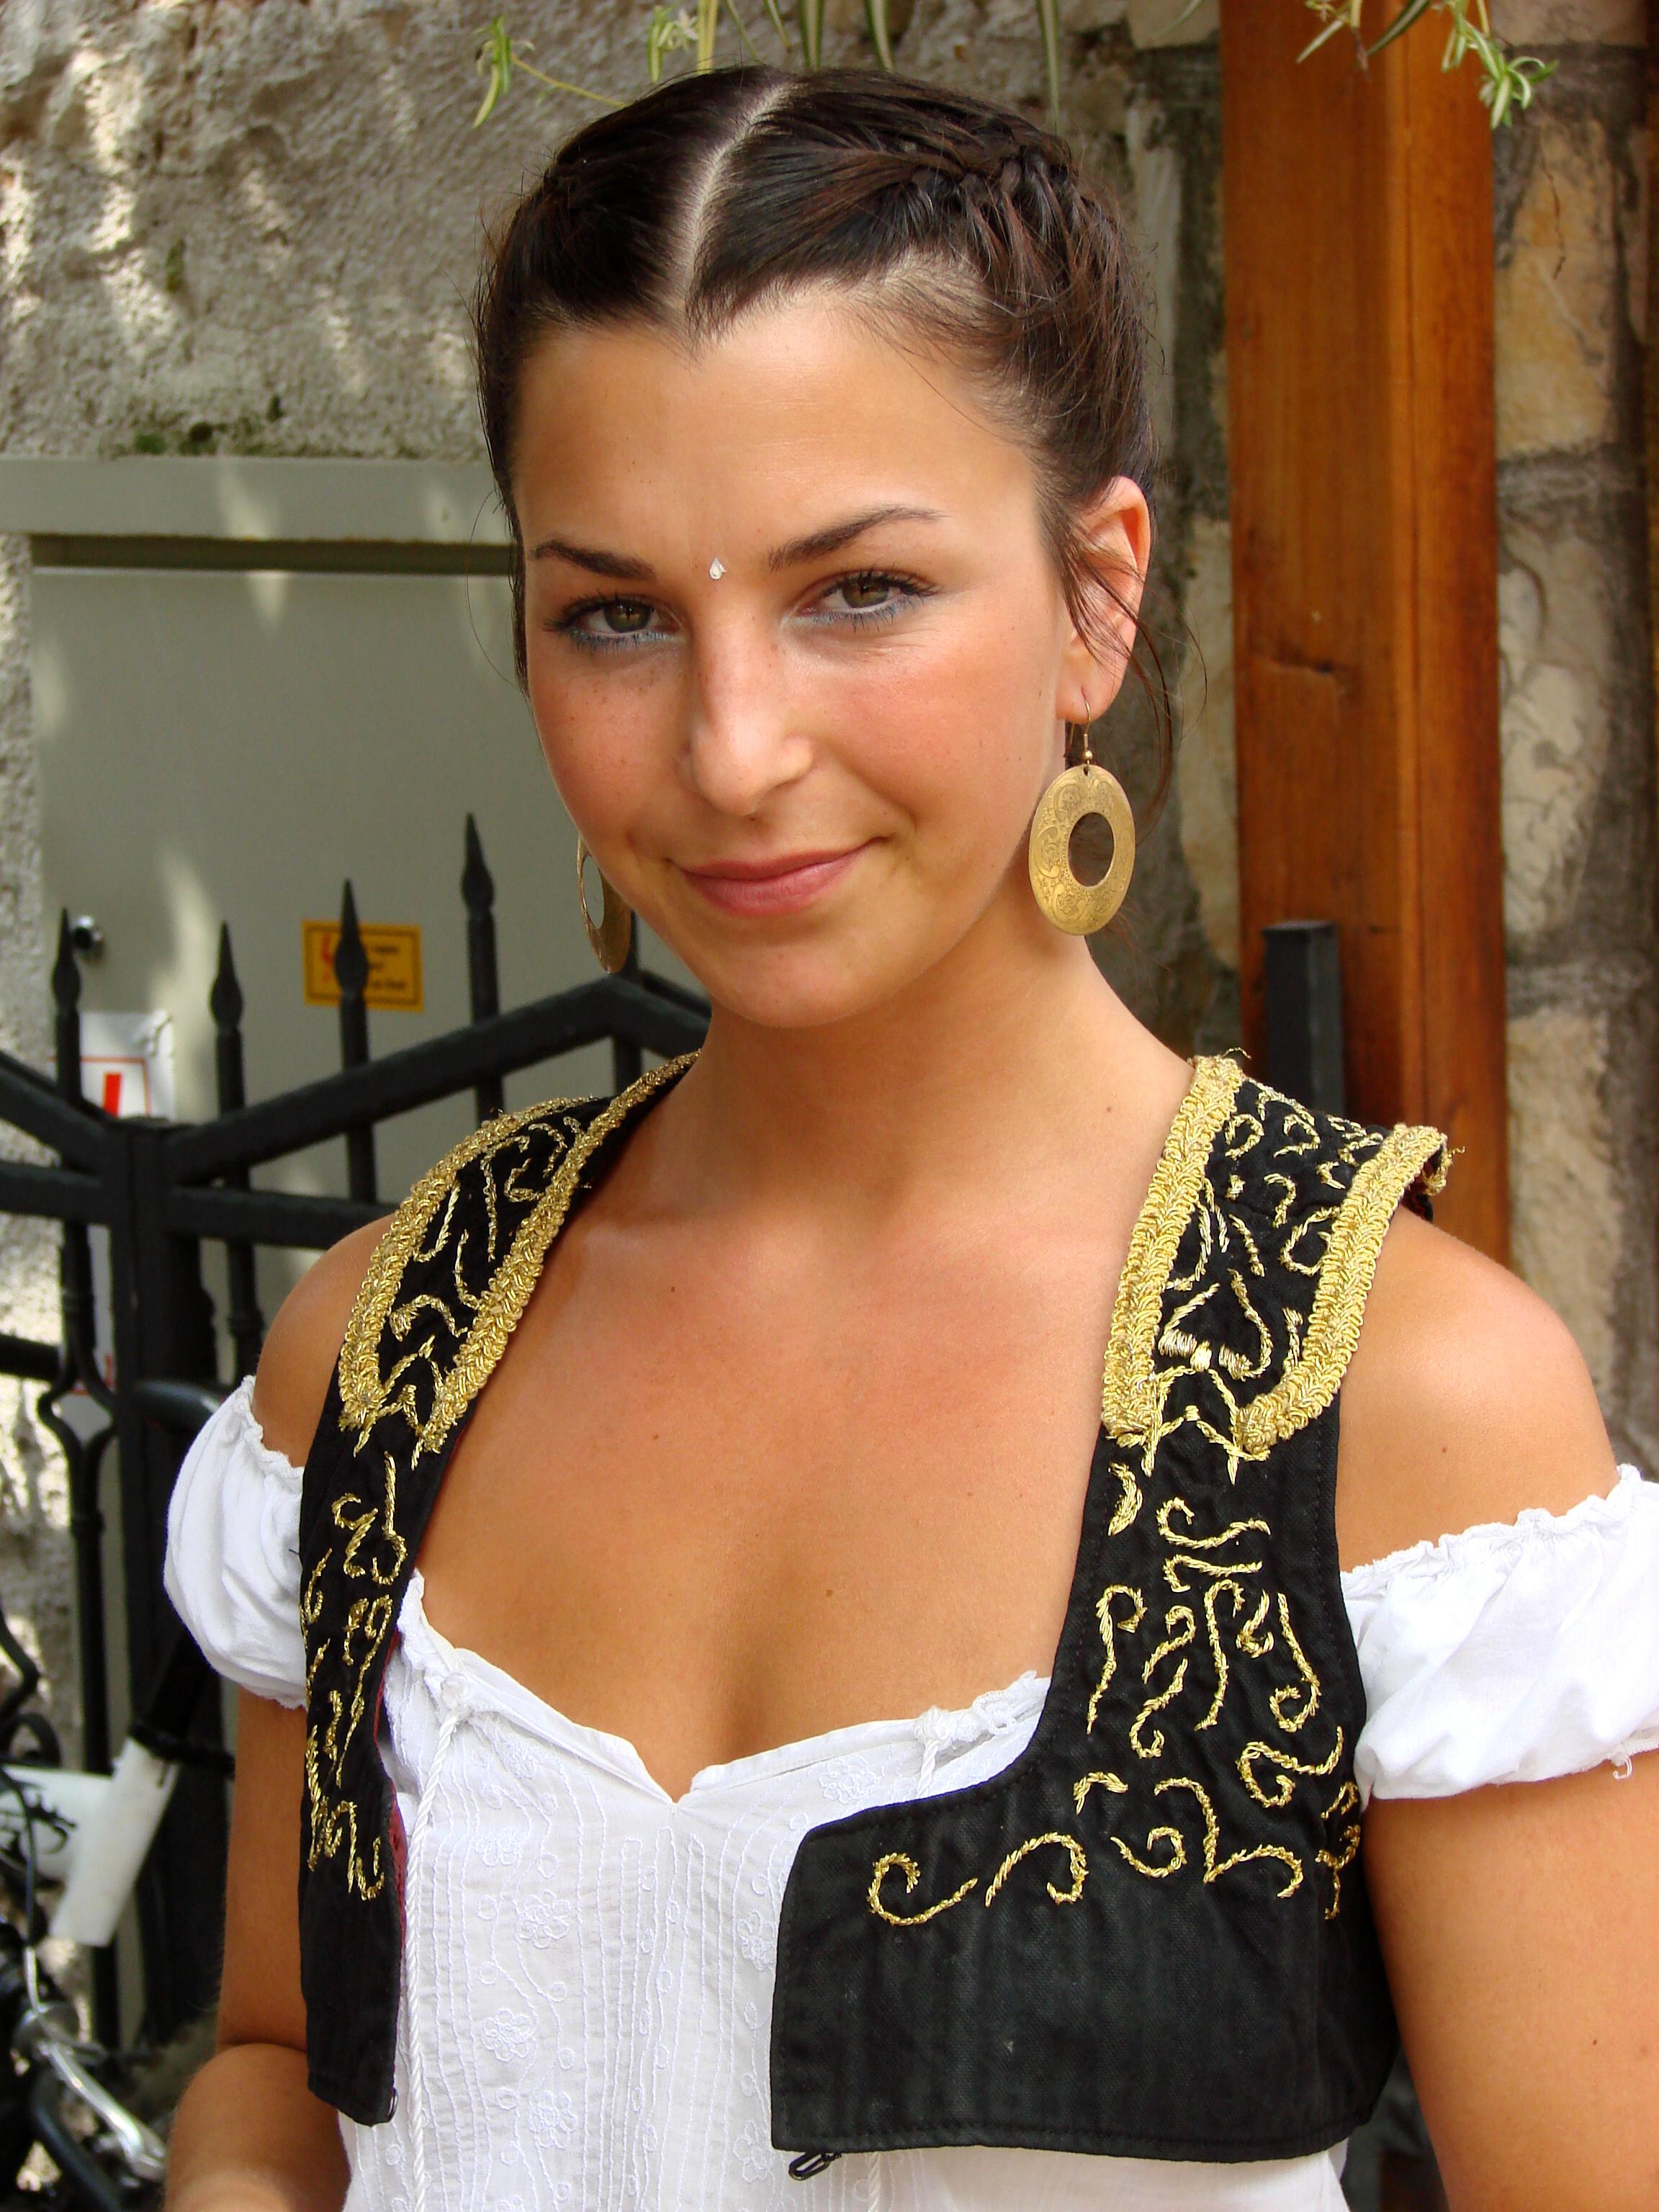 Sorry, that Bosnia and herzegovina girls